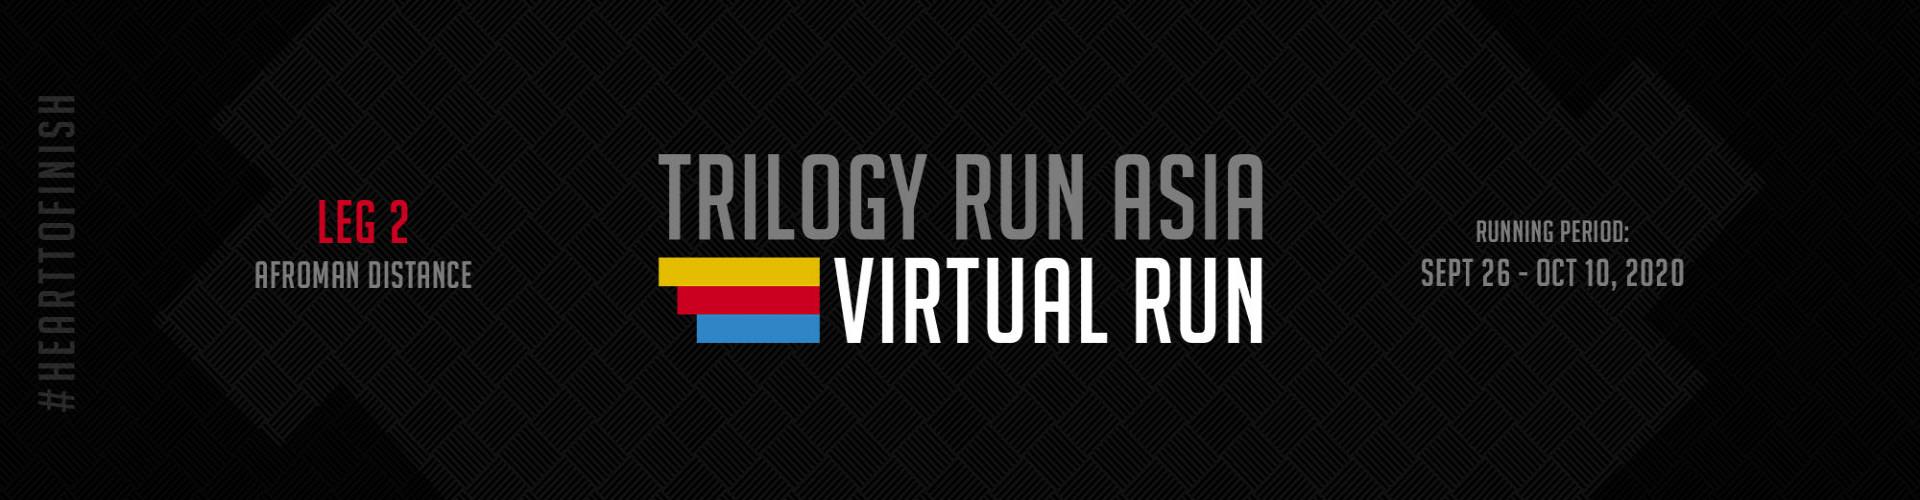 TRILOGY Run Asia Leg 2